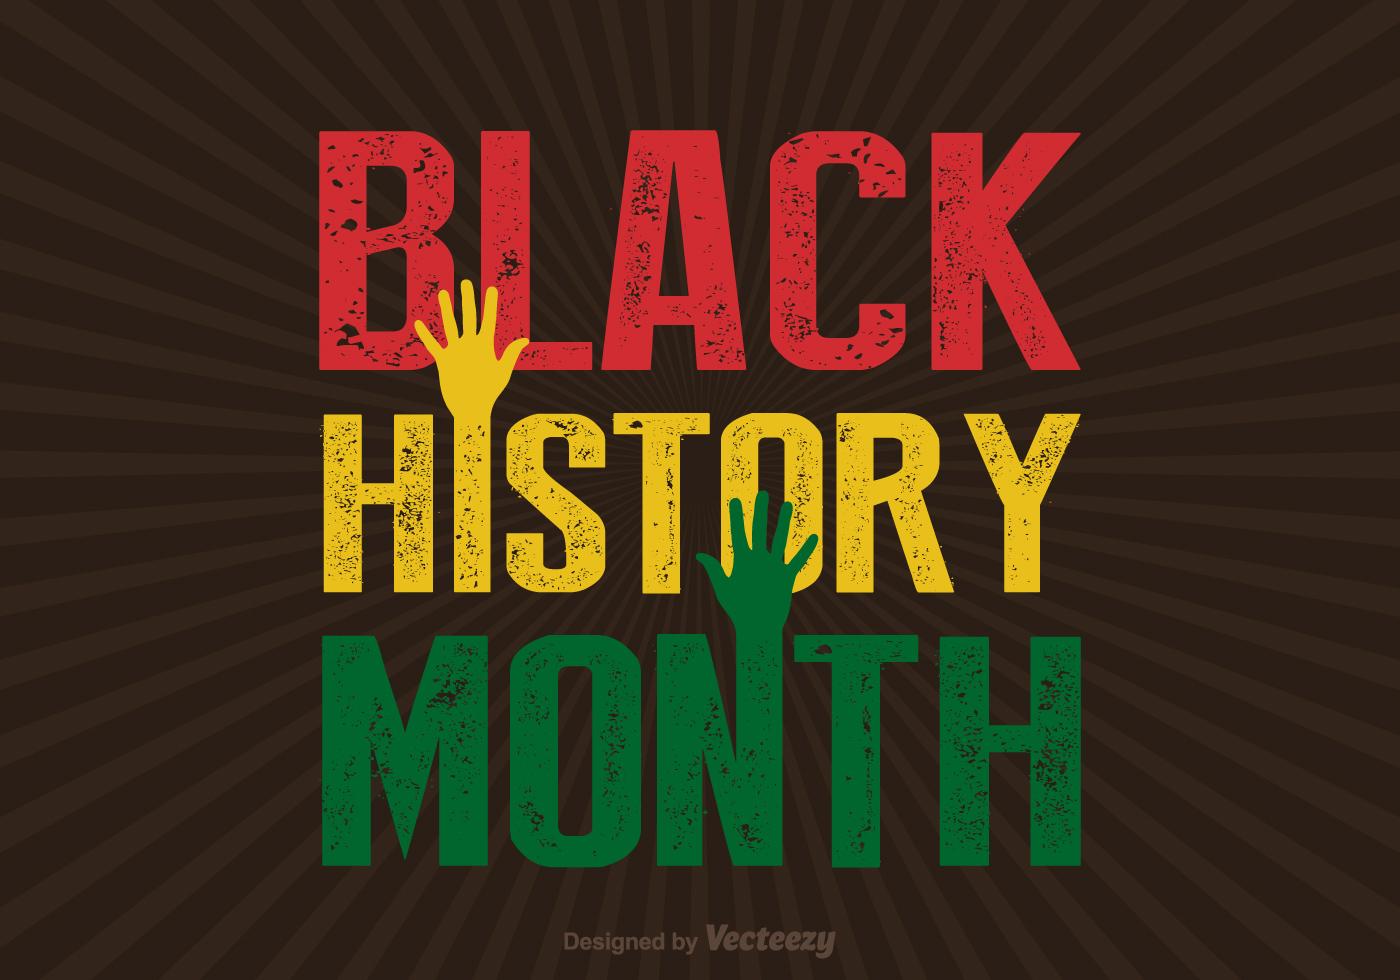 Black History Month Sunburst Vector Background Download Free Vectors Clipart Graphics Vector Art